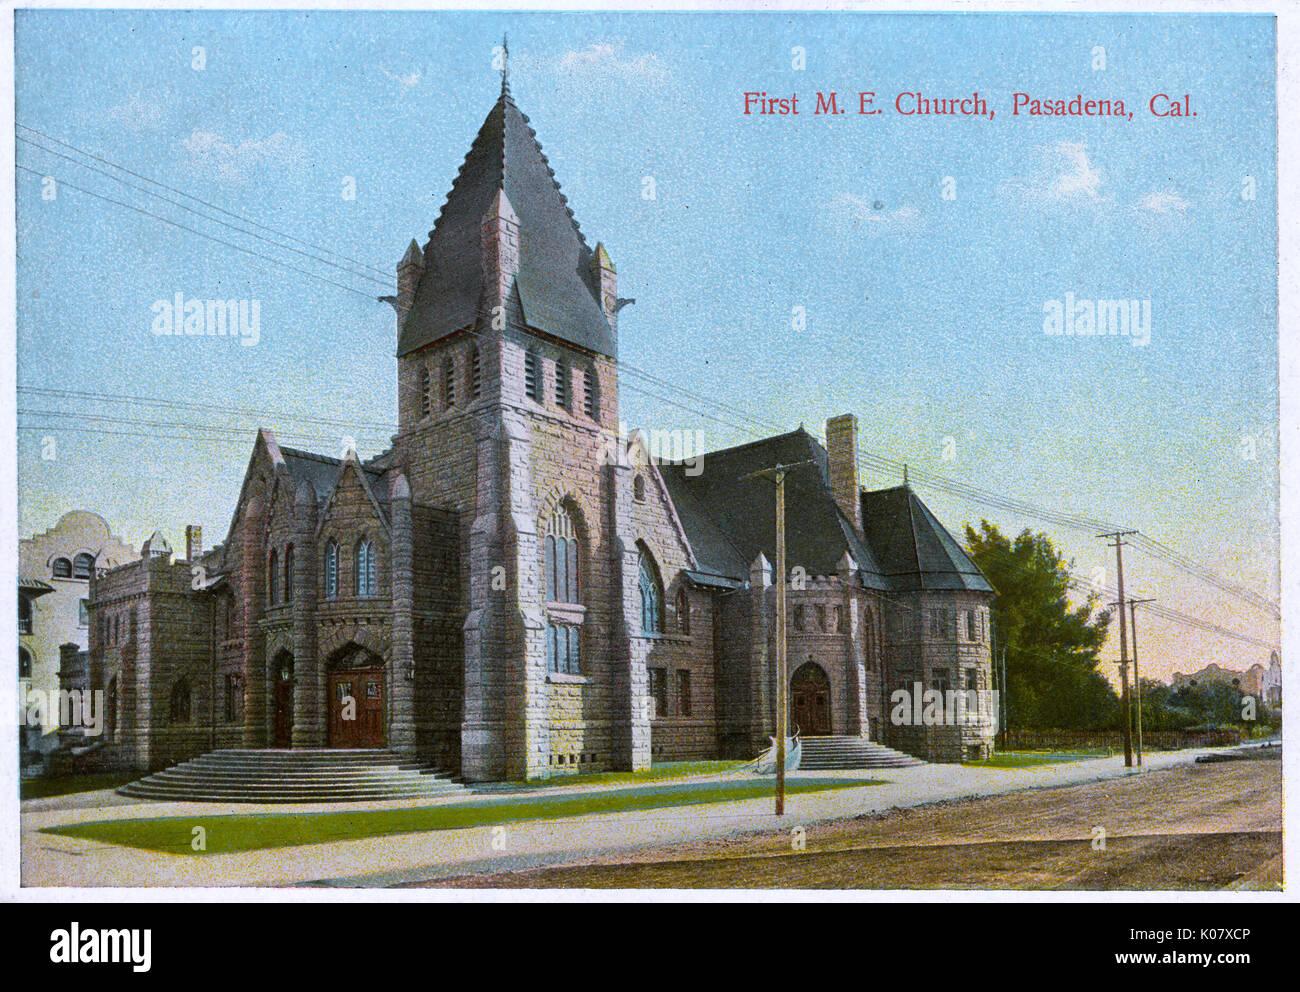 First Methodist Episcopal Church, on the corner of Colorado Street and Marengo Avenue, Pasadena, California, USA. Stock Photo